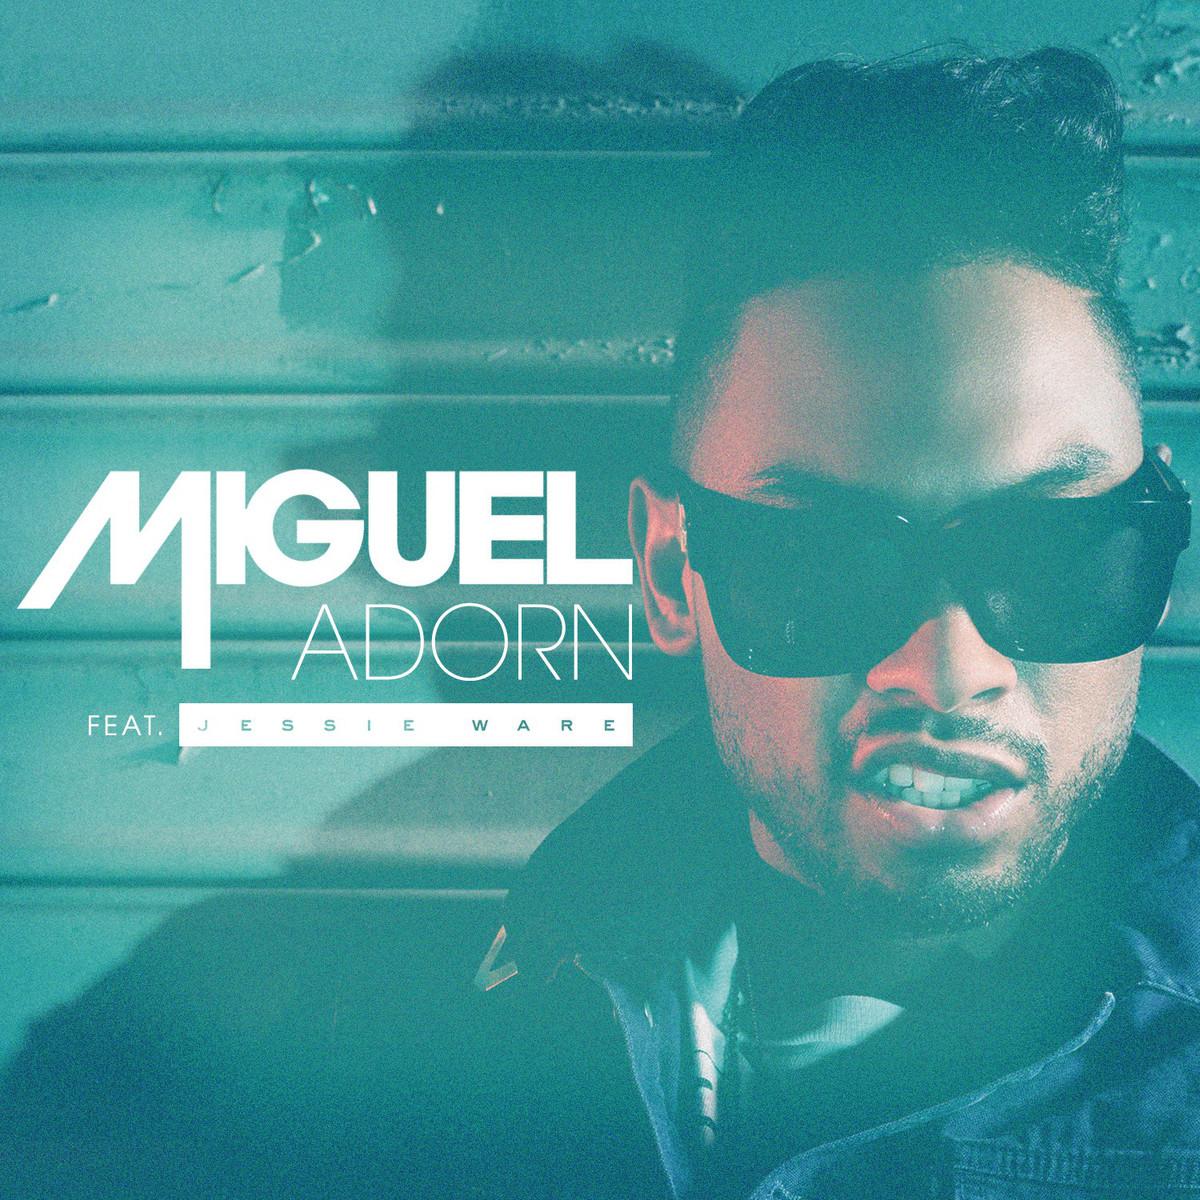 Miguel-Adorn-Remix-feat.-Jessie-Ware-2013-1200x1200.png